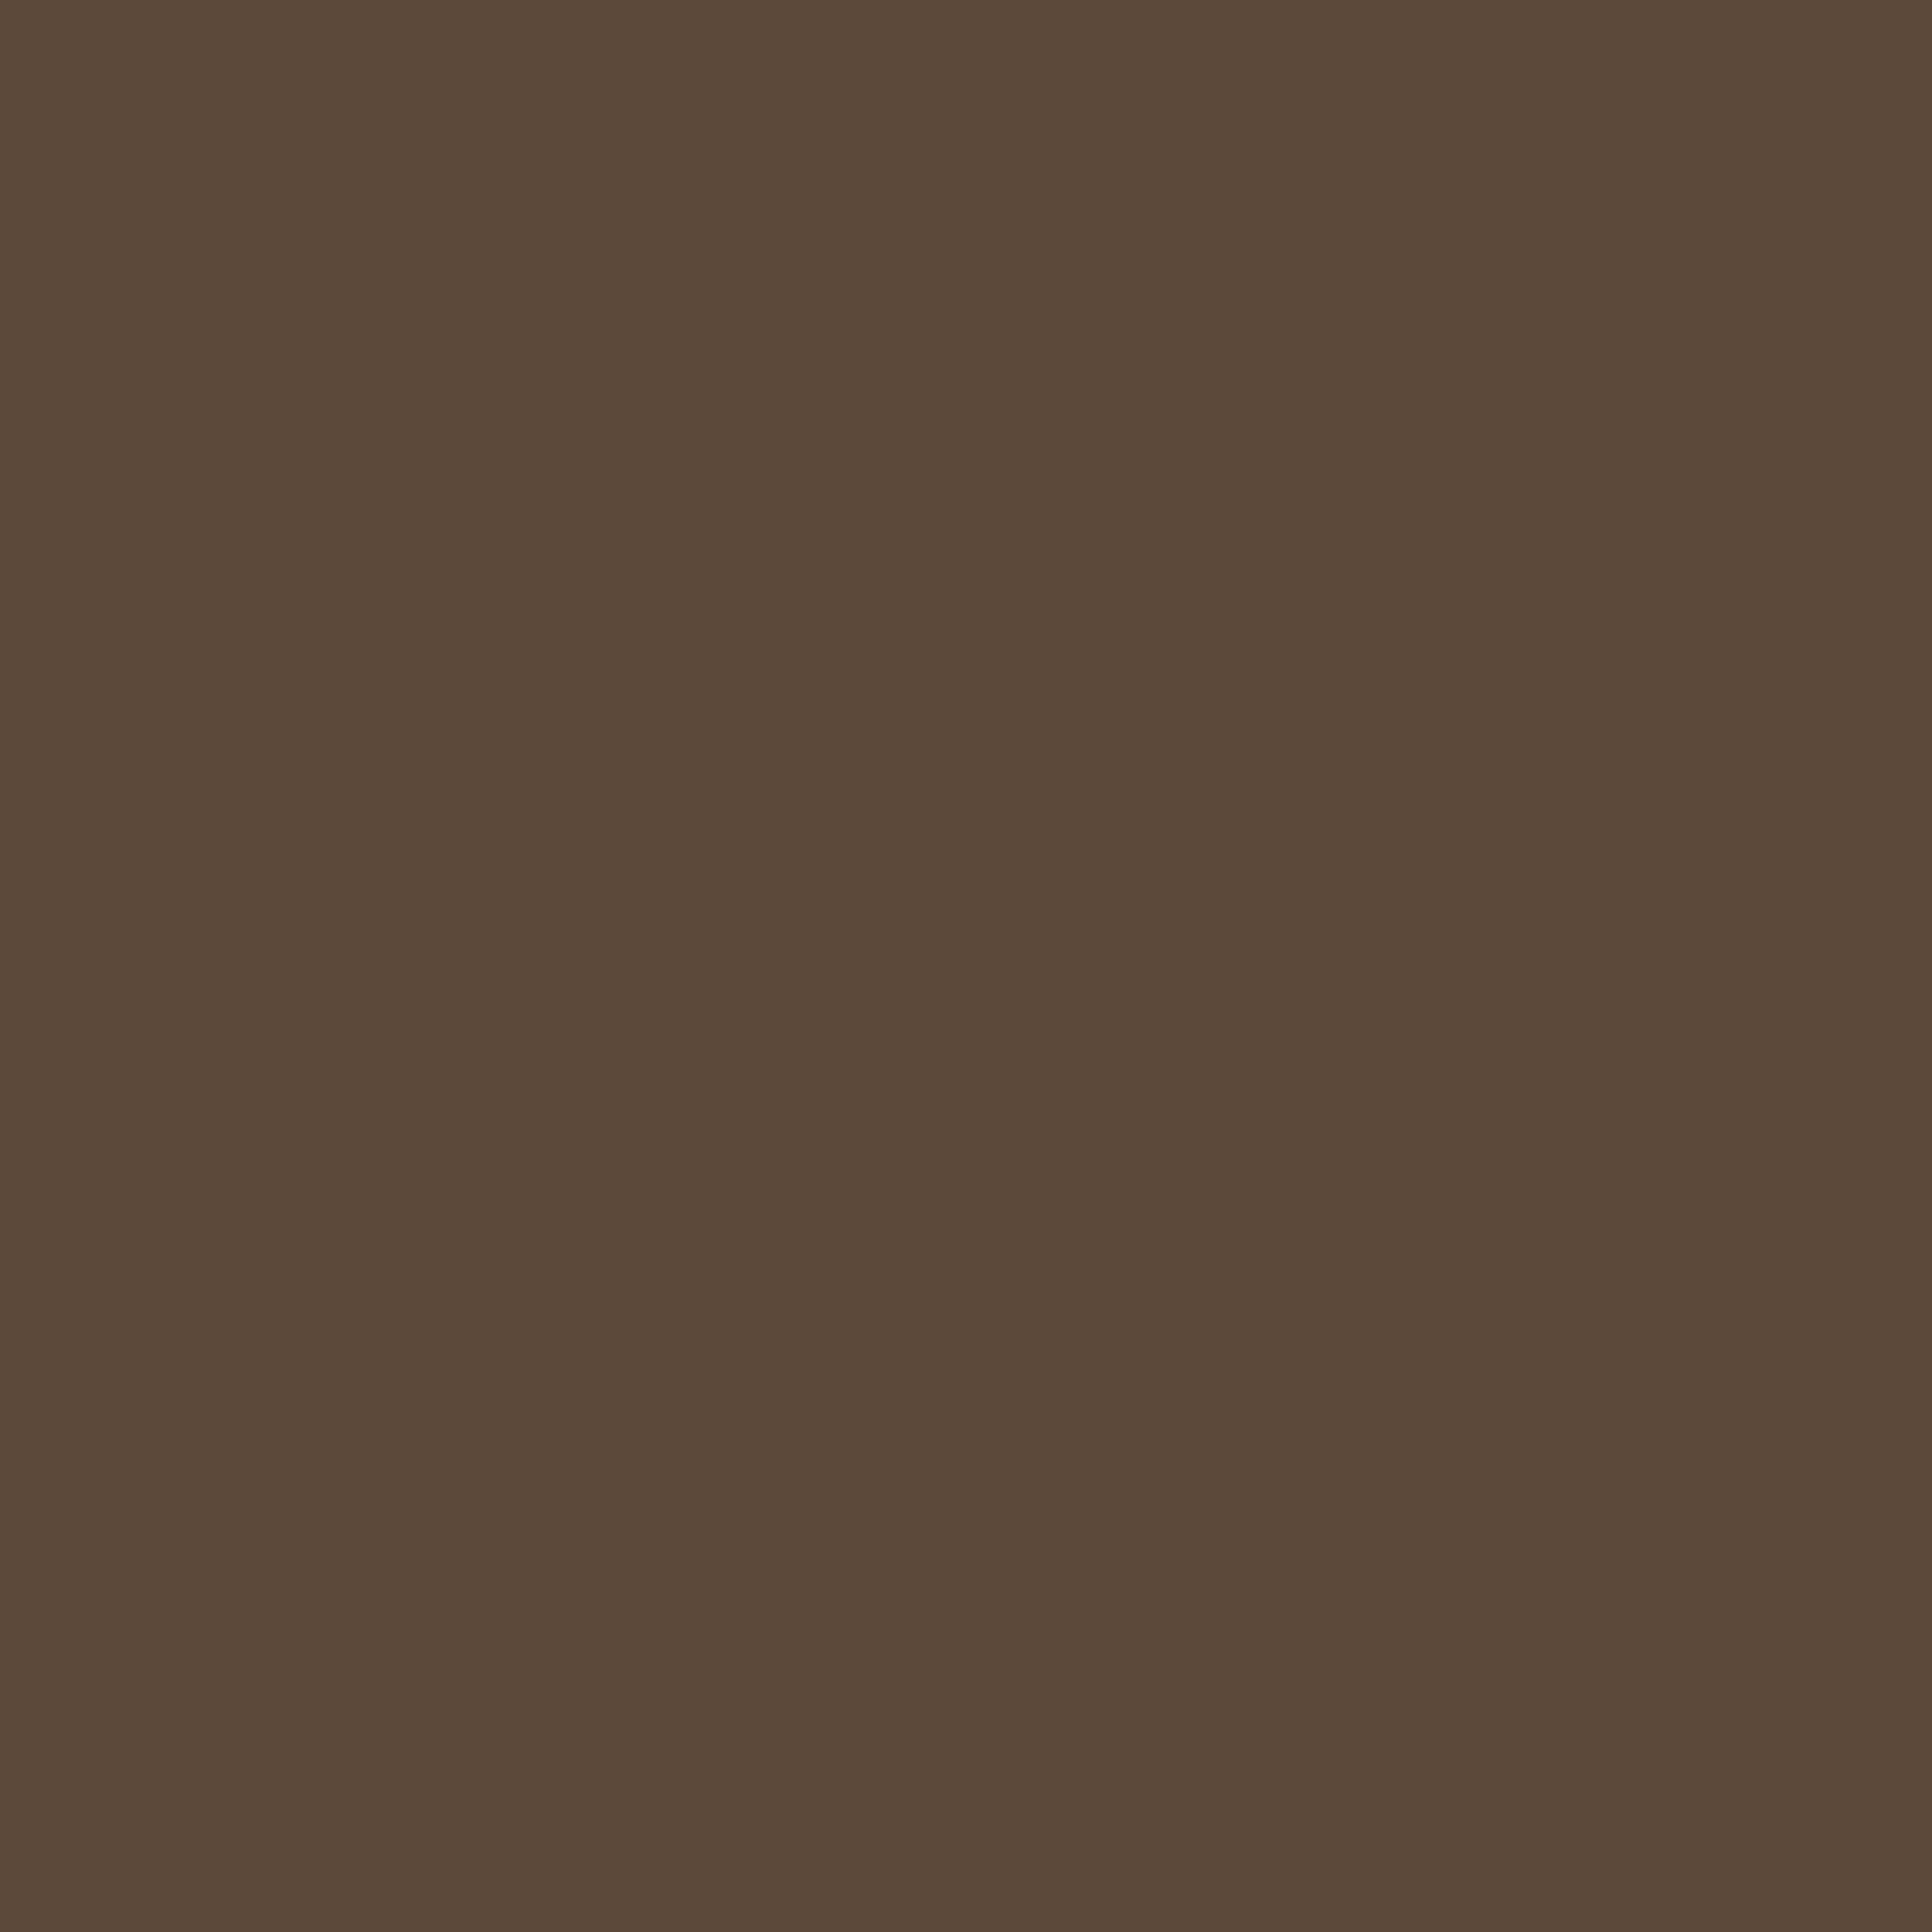 Braun-granit